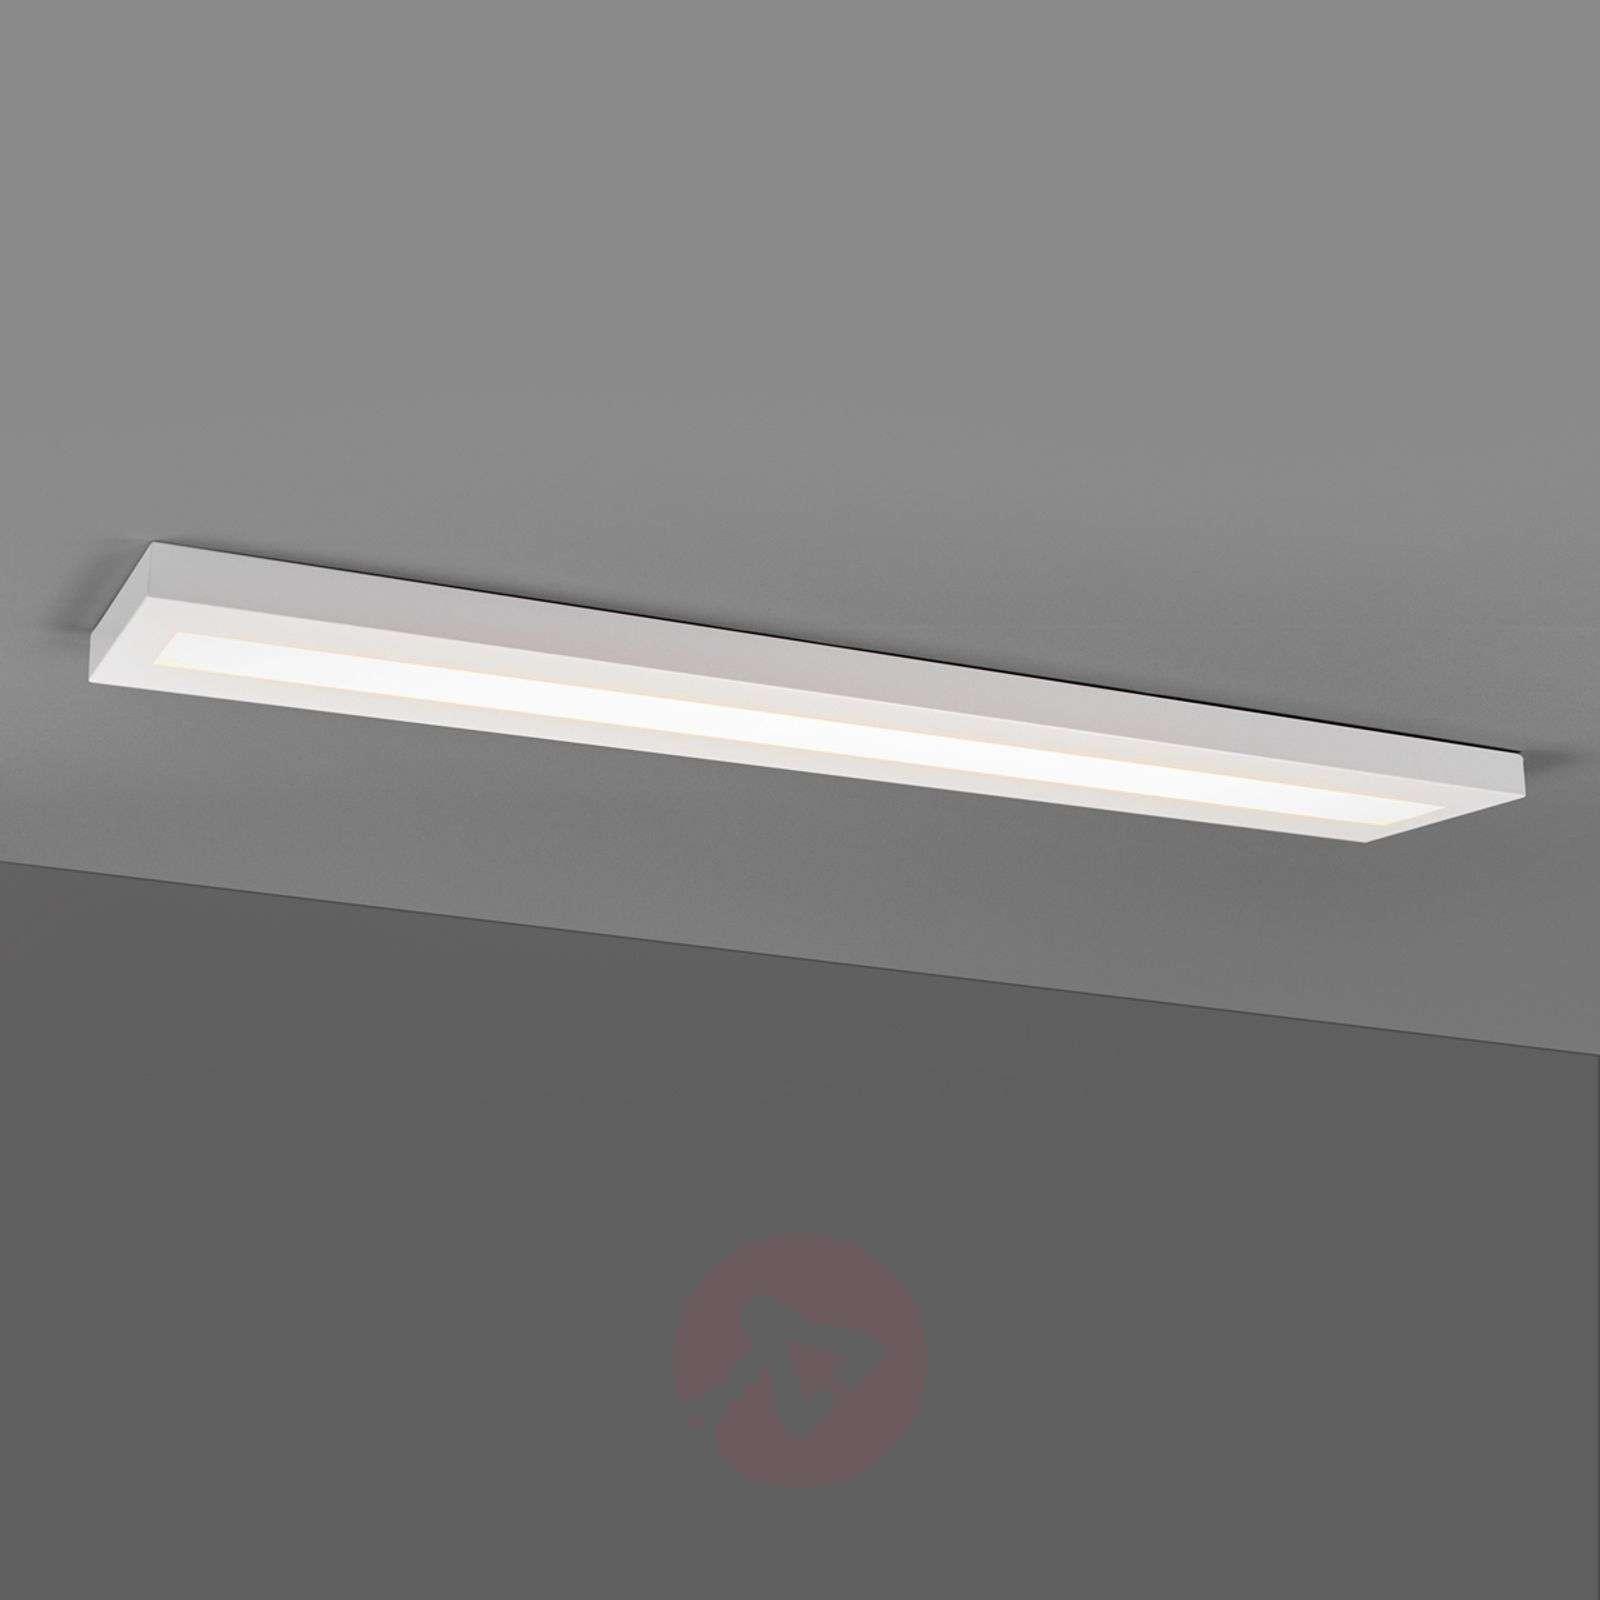 Slimline LED light 36/38W OSRAM LEDs-3002128X-01